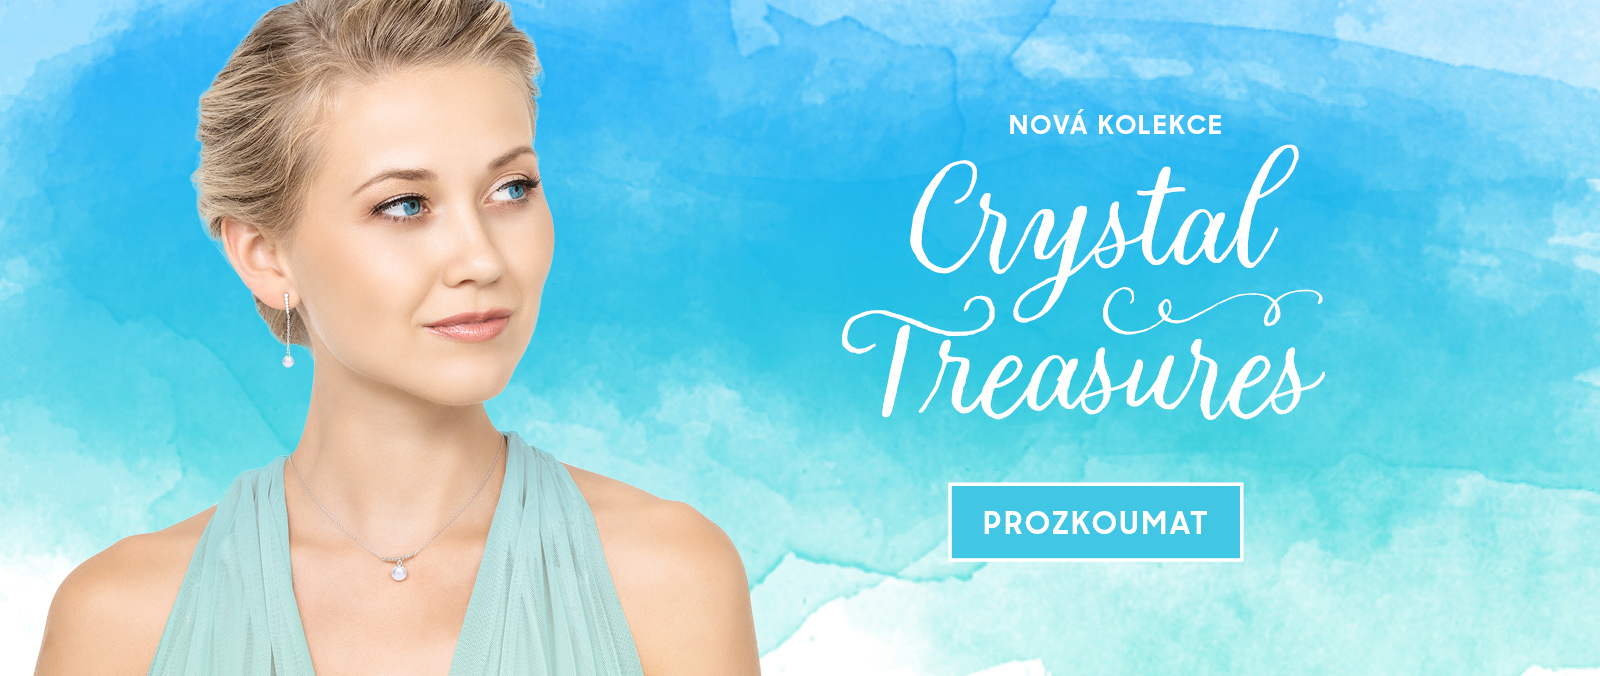 Nová kolekce Crystal Treasures